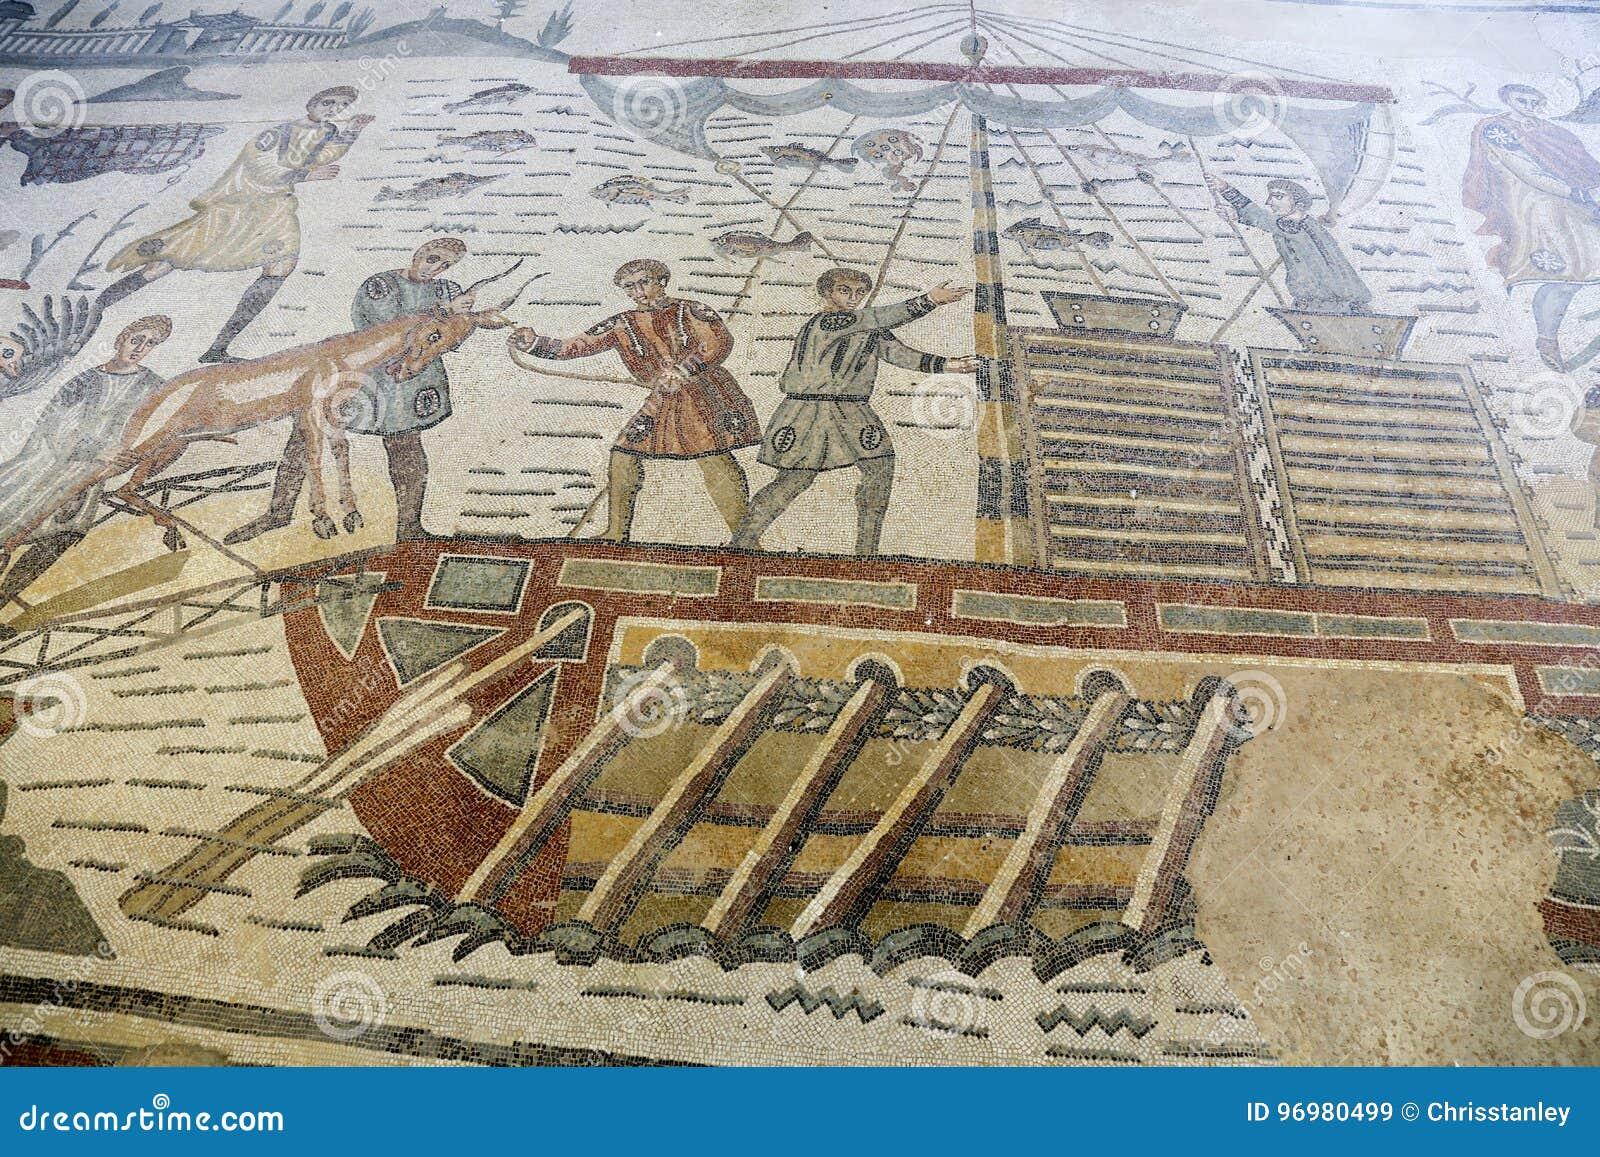 Mosaic at roman villa in sicily